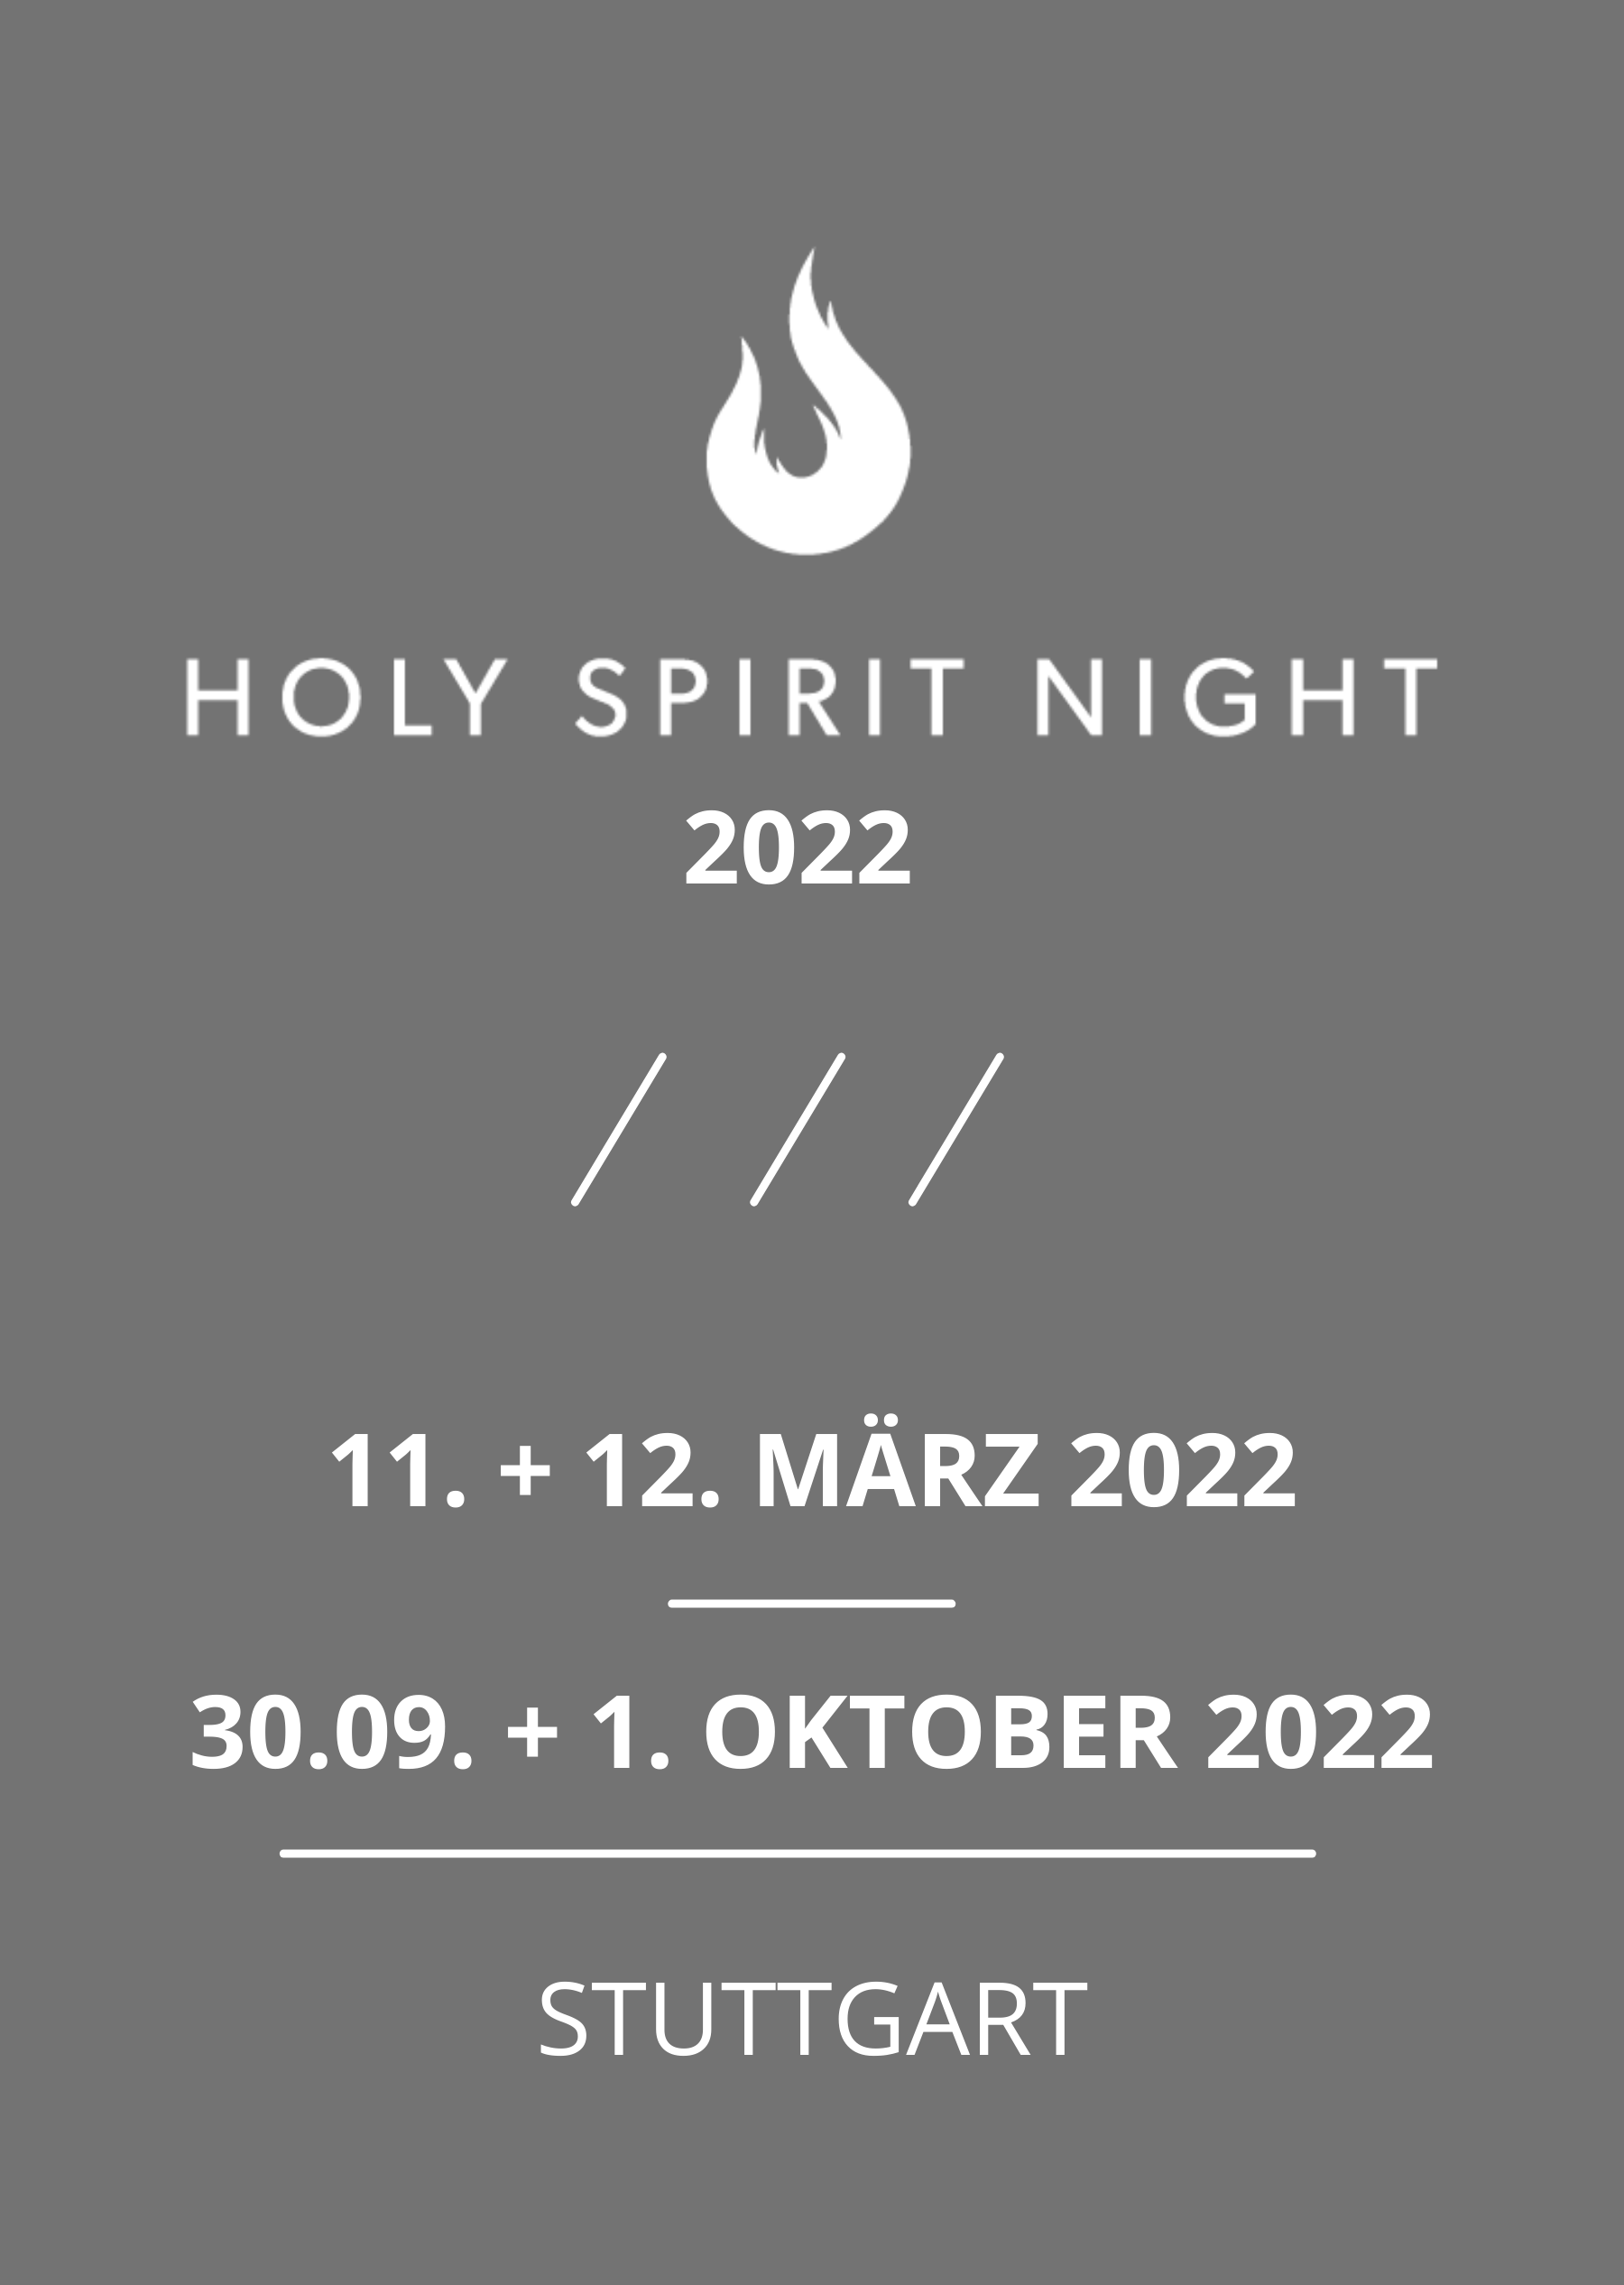 Holy Spirit Night 2022